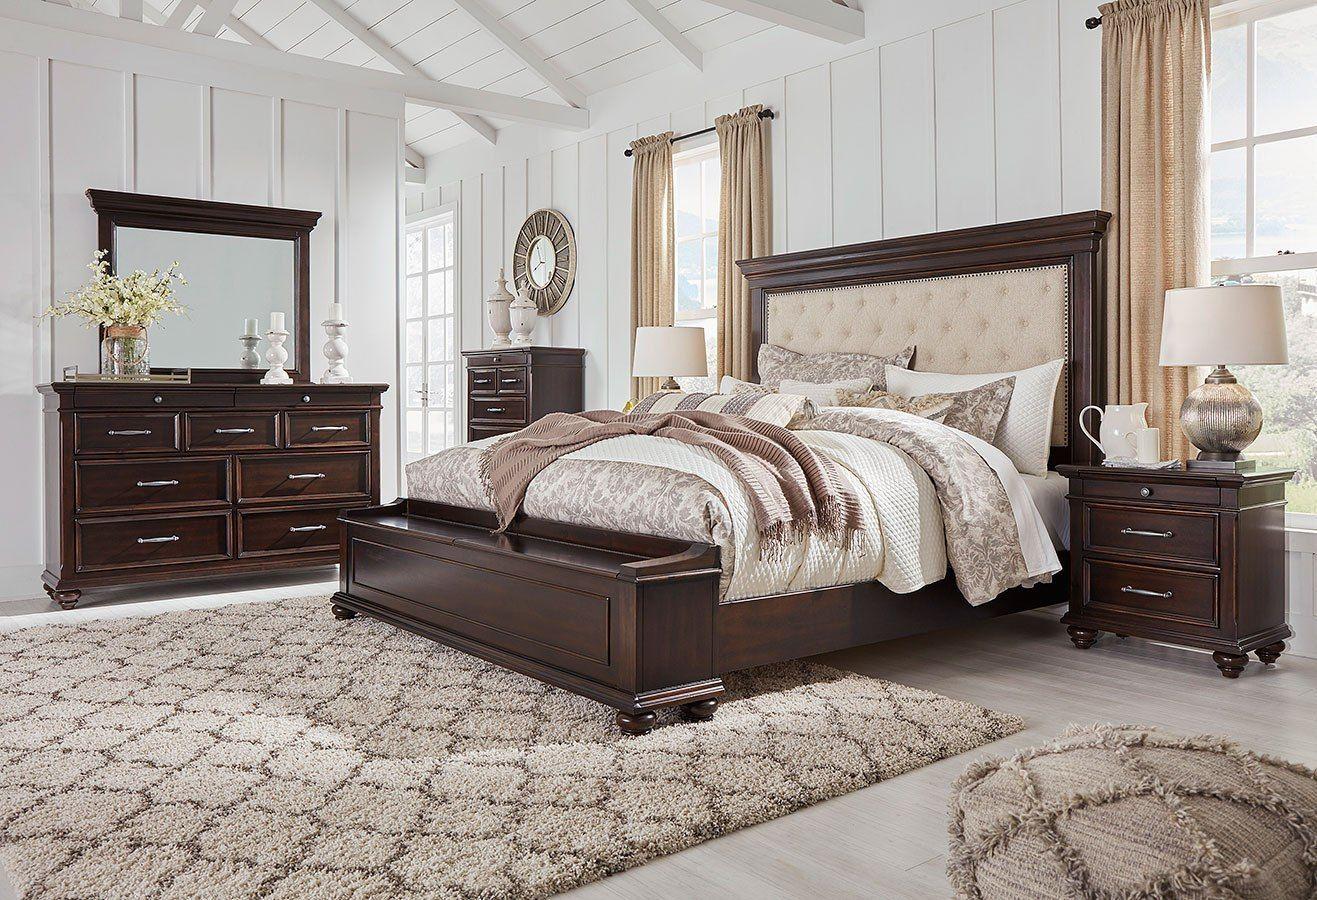 Brynhurst Upholstered Storage Bedroom Set Brown Furniture Bedroom Dark Brown Bedrooms King Bedroom Sets